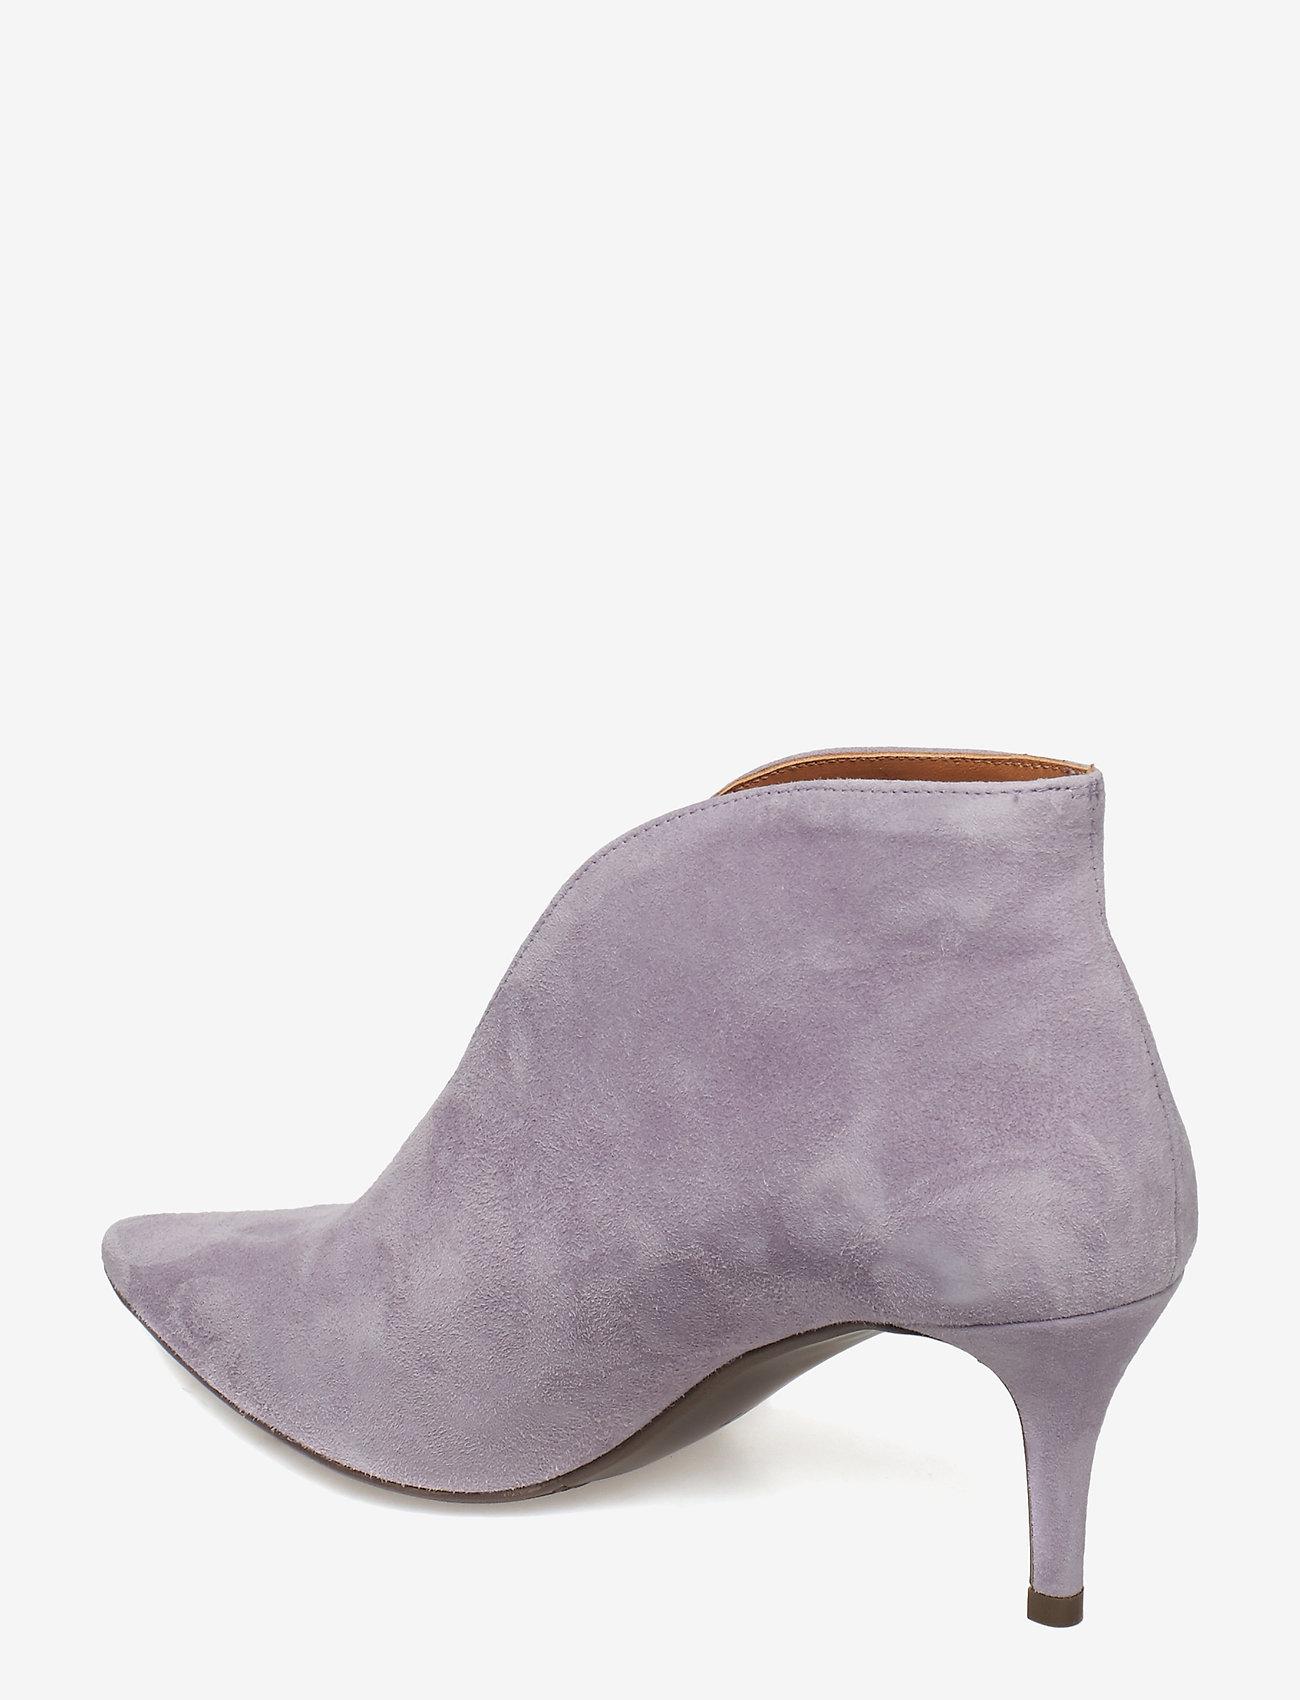 Boots (Lavender Marsiglia Suede 581) - Billi Bi